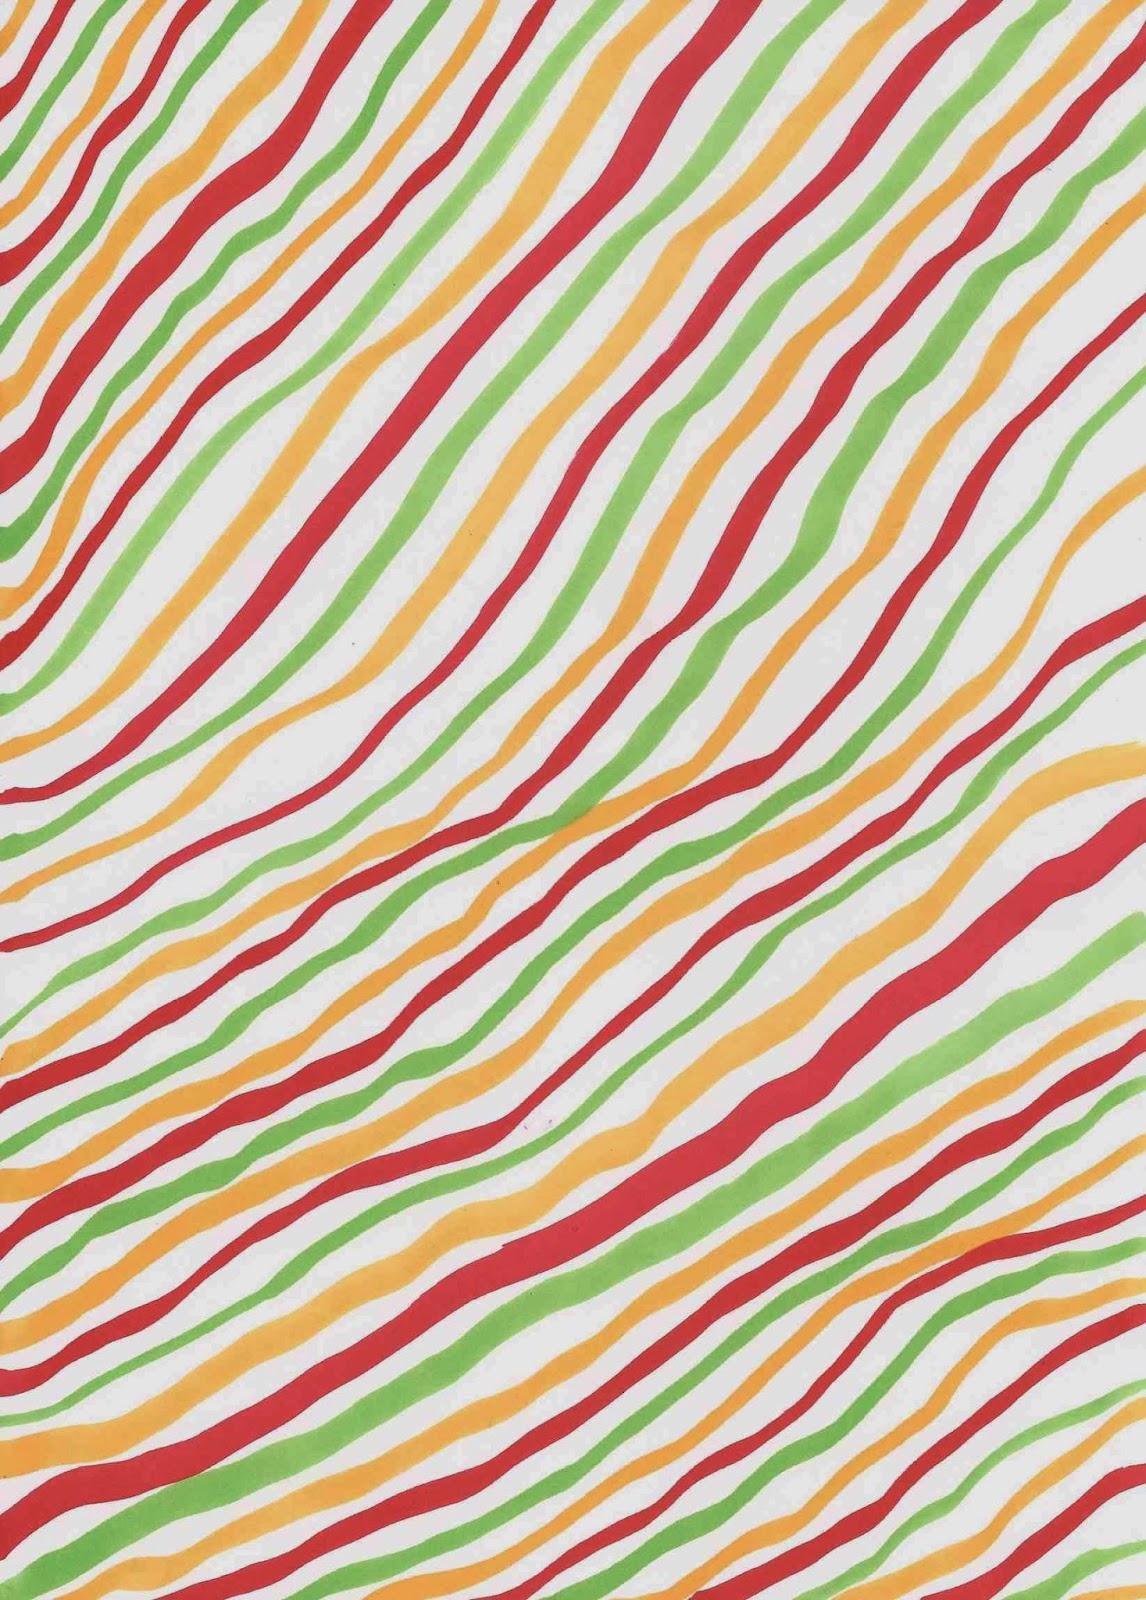 http://2.bp.blogspot.com/-D5Zj7BnRz9E/Uu7JcL1l0WI/AAAAAAAAcDs/xdmP2uGXdXo/s1600/wonky+stripes.jpg